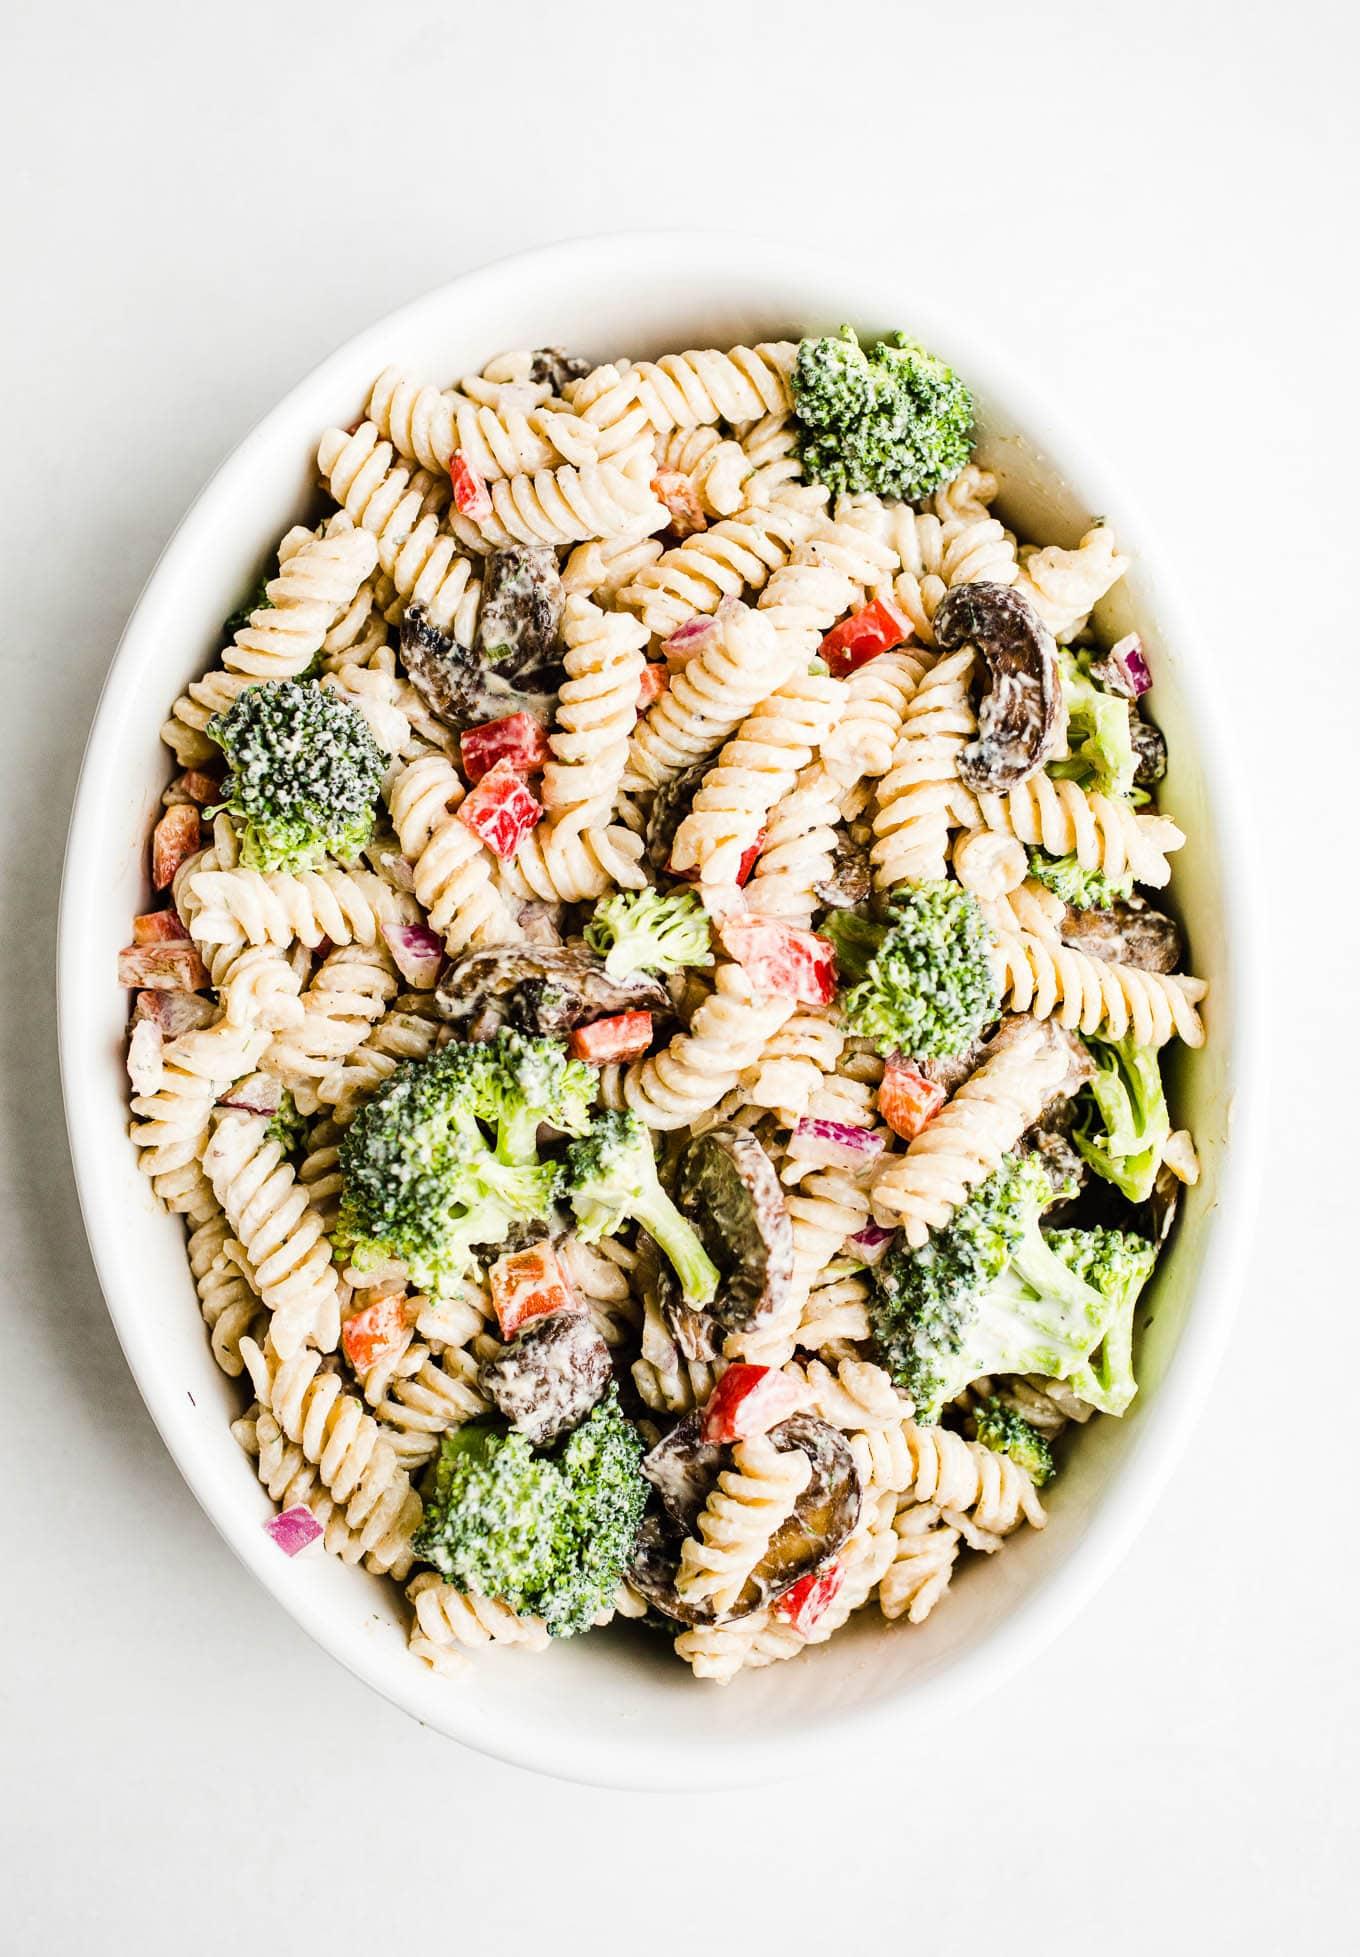 creamy pasta salad in white bowl